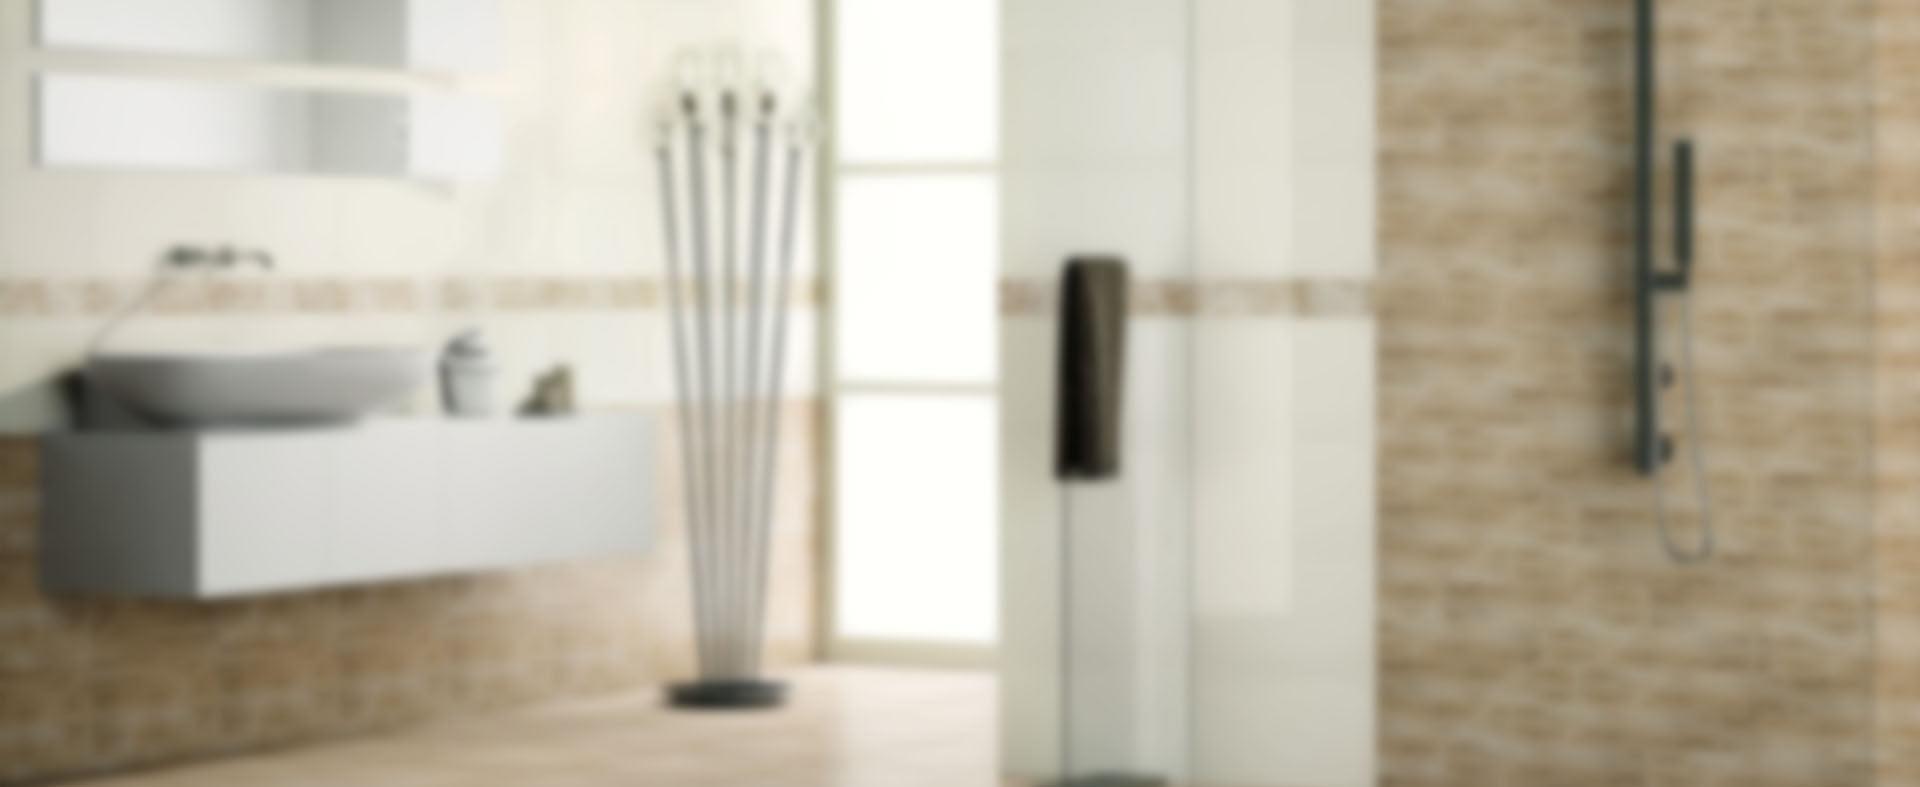 Original Tiles Indiatiles Tiles Tilesdigital Wall Tiles Exporterbathroom